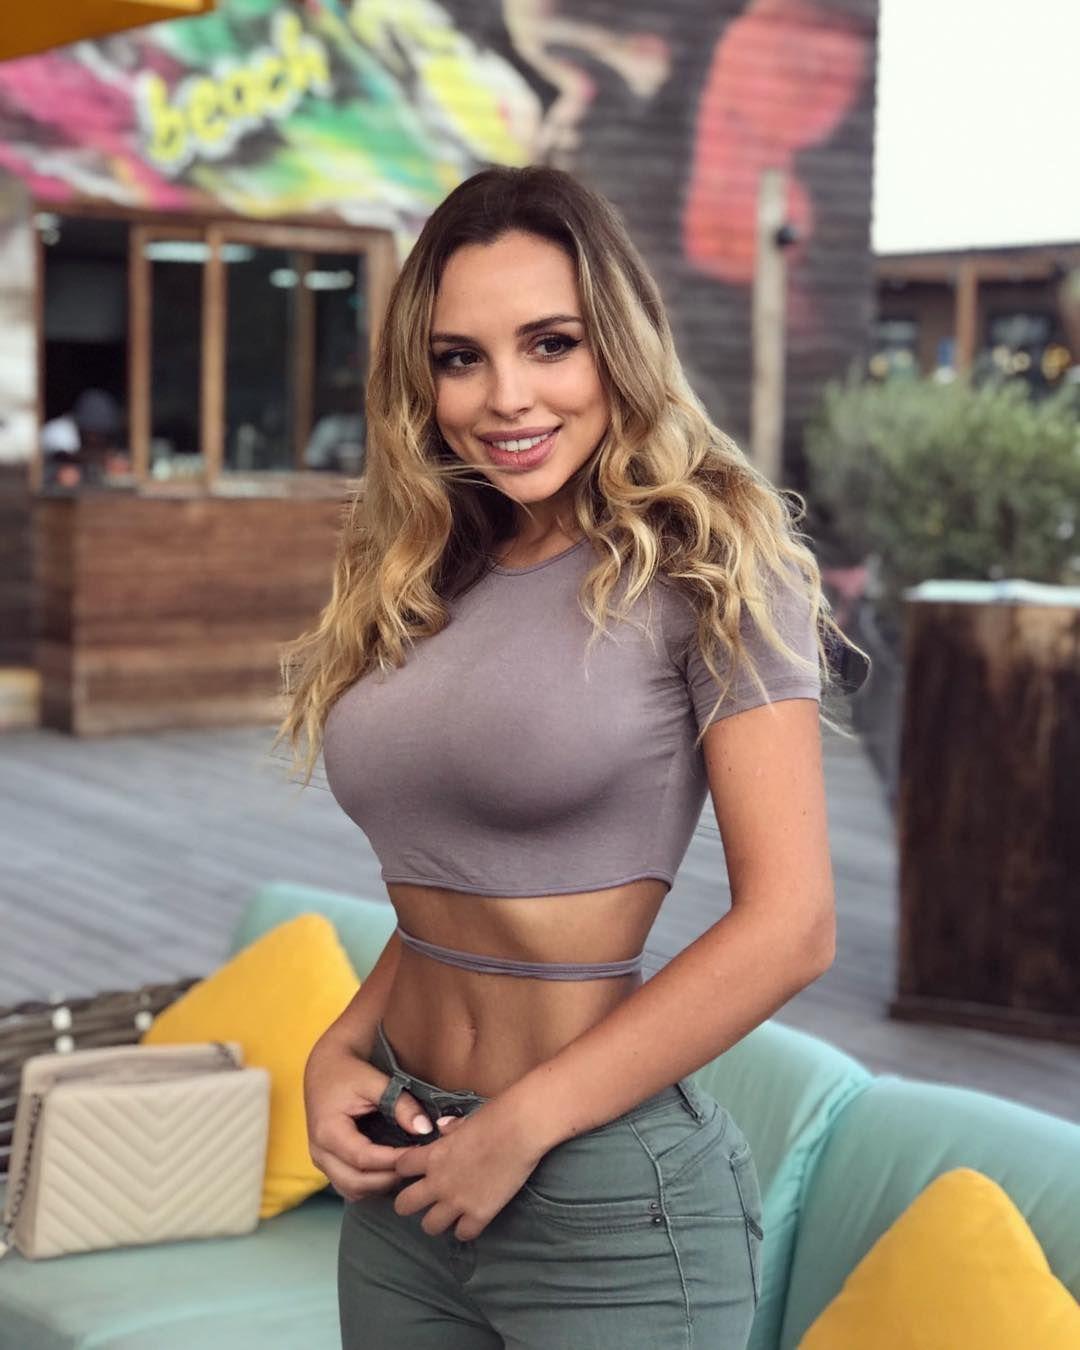 Instagram Veronica Maya nudes (27 photos), Topless, Sideboobs, Boobs, butt 2020